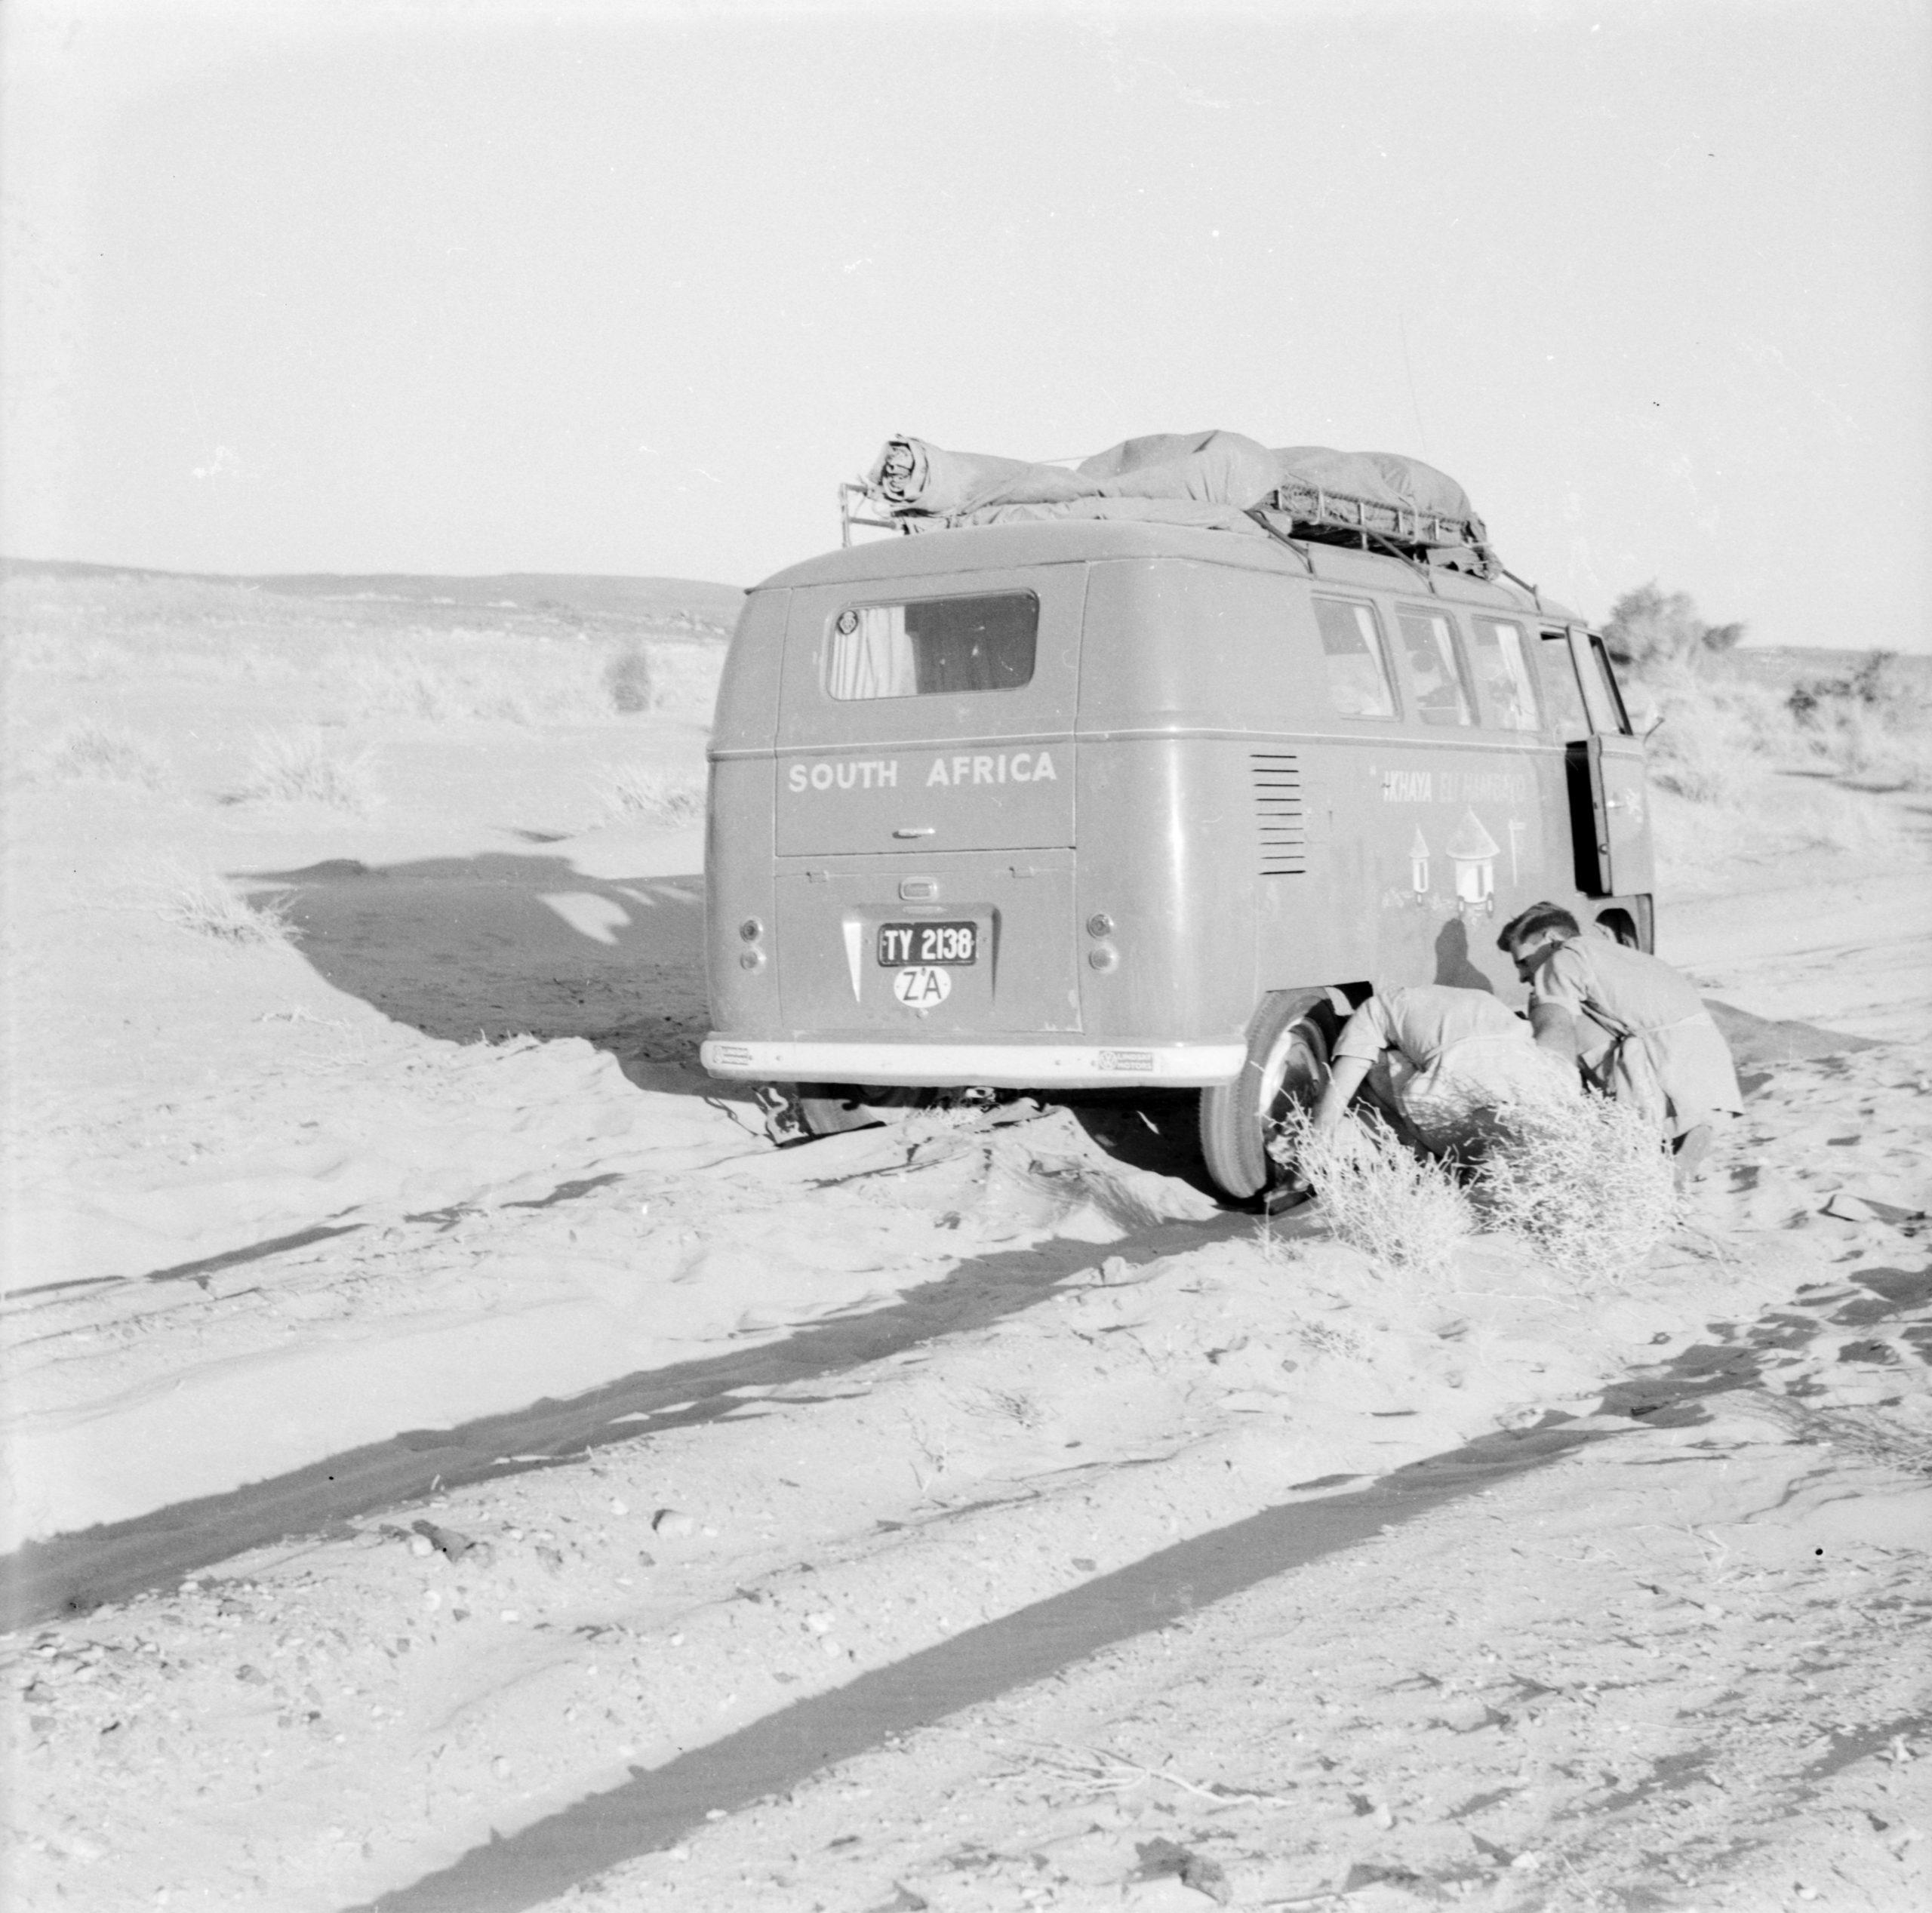 Home is a Journey - Feb 26 - desert crossing